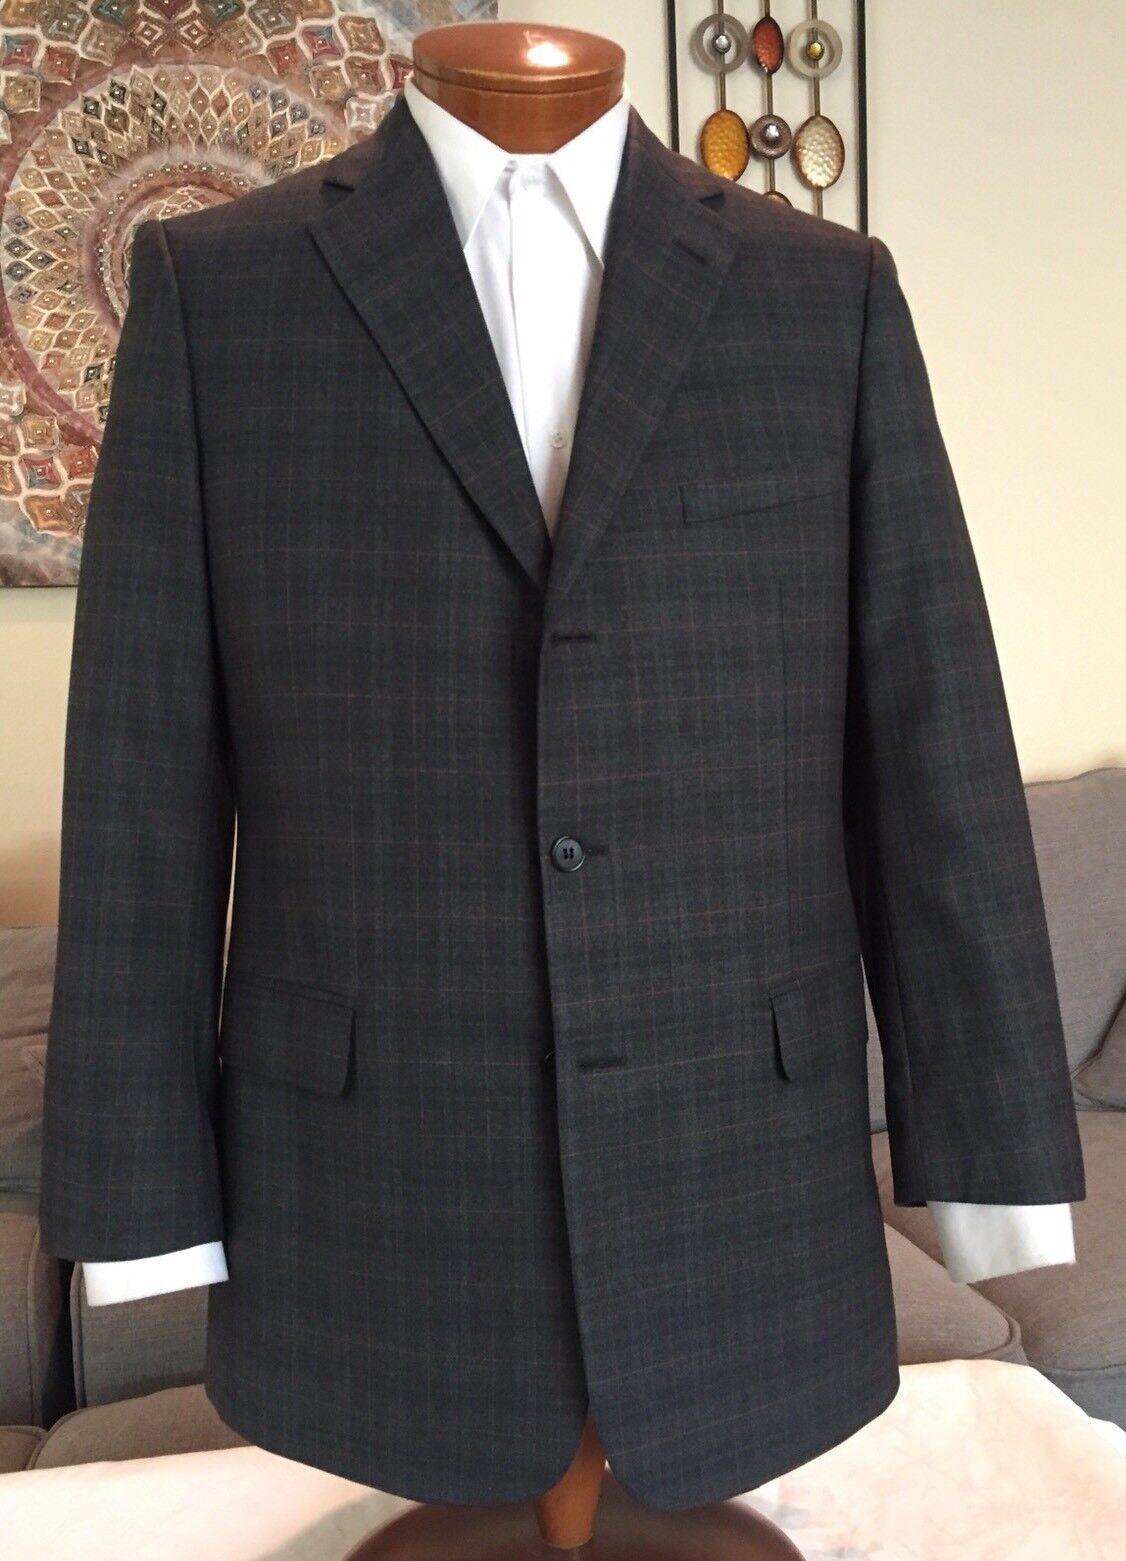 NEW Stunning Dunhill  Herren grau Plaid 3 Btn Dual Vent Suit Sz 40 R